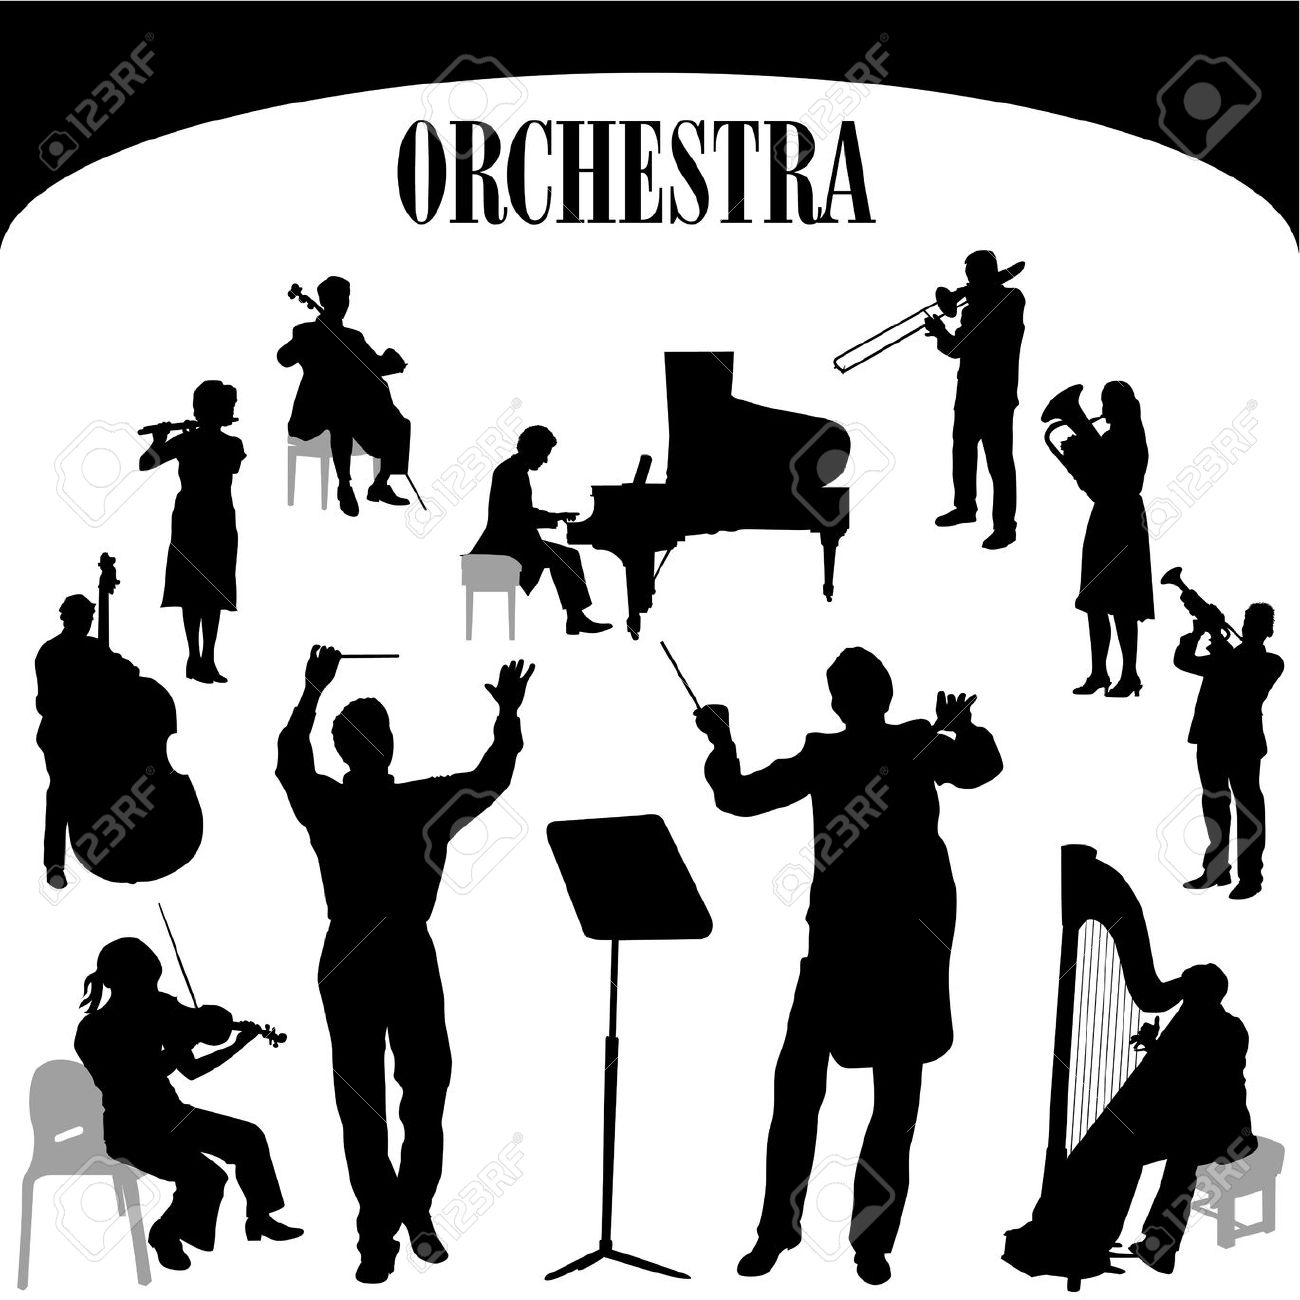 Orchestra cliparts